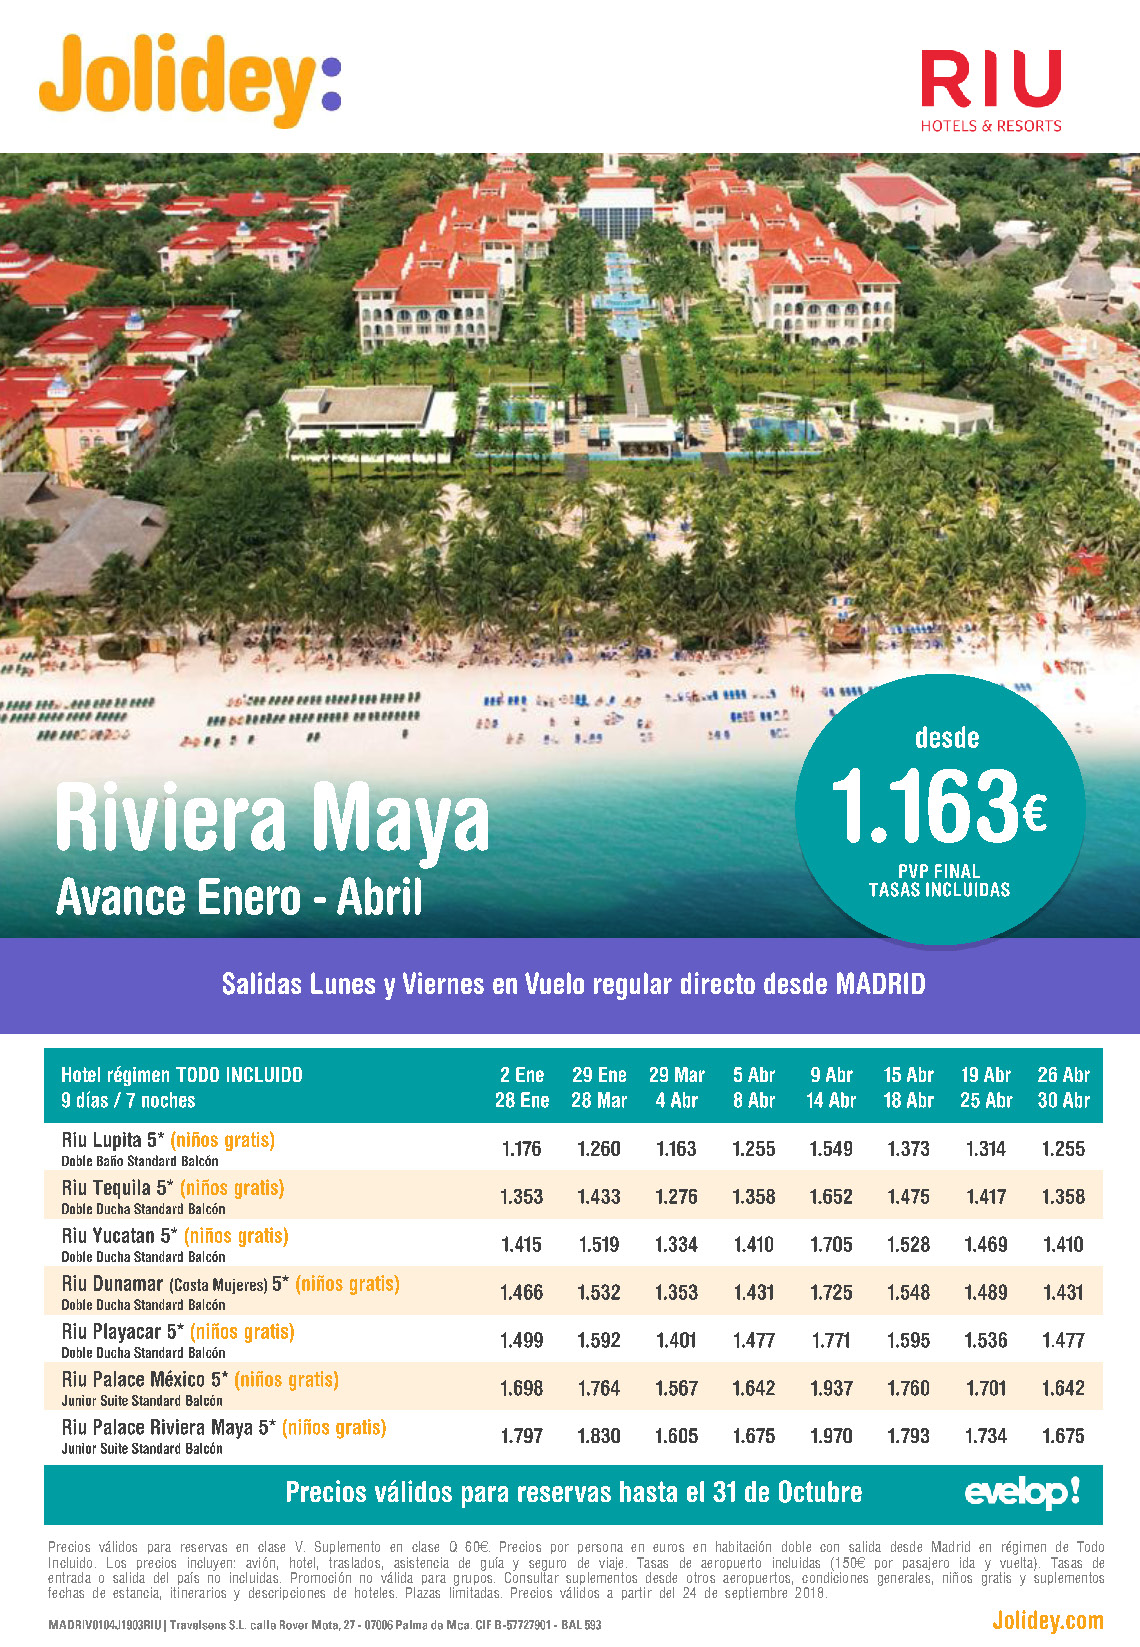 Oferta Jolidey RIU Riviera Maya Venta Anticipada Invierno 2019